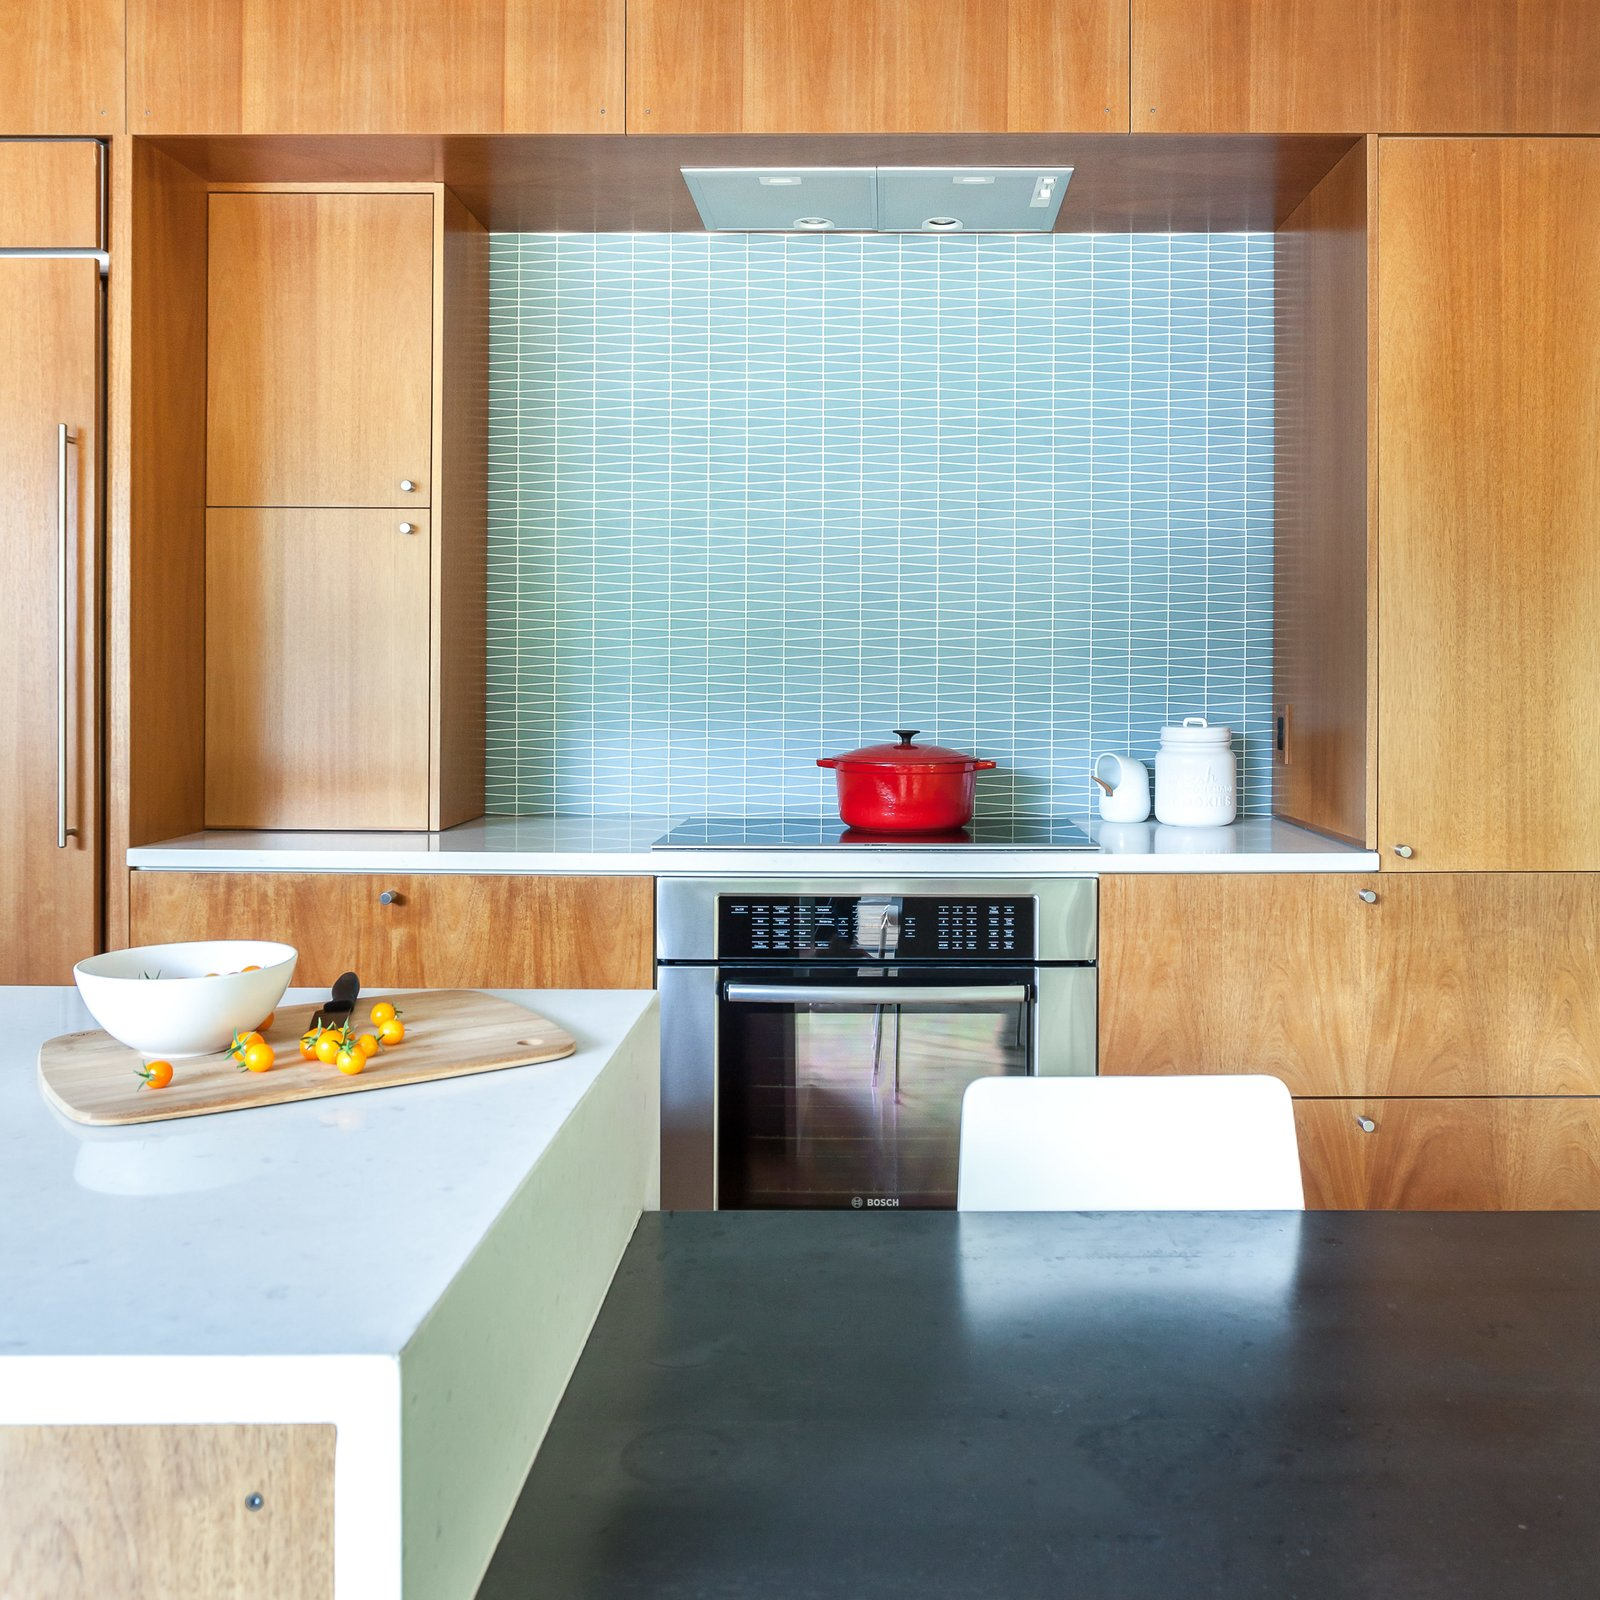 #kitchens #modern #midcentury #interior #inside #indoors #lighting #geometric #glass #tile #backsplash #induction #cooktop #Crate&Barrel #IslandStone #Bosch #1968 #Reno #HobsonRenovation #Hawkins&Associates  INTERSTICE Architects's Favorites from house design